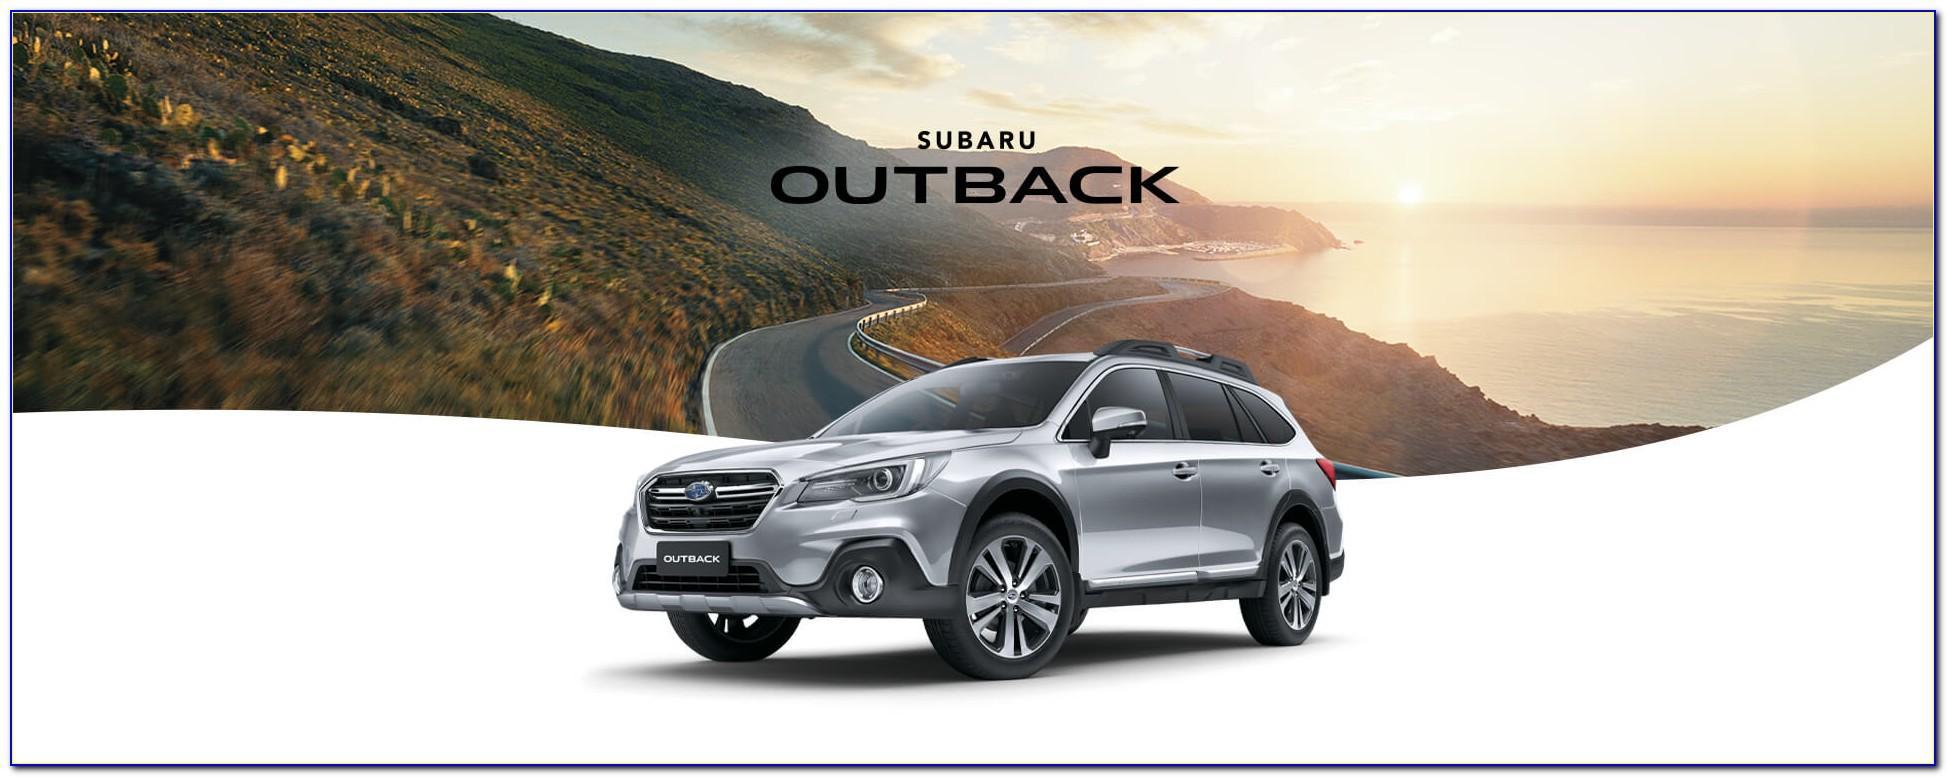 Subaru Outback Brochure 2015